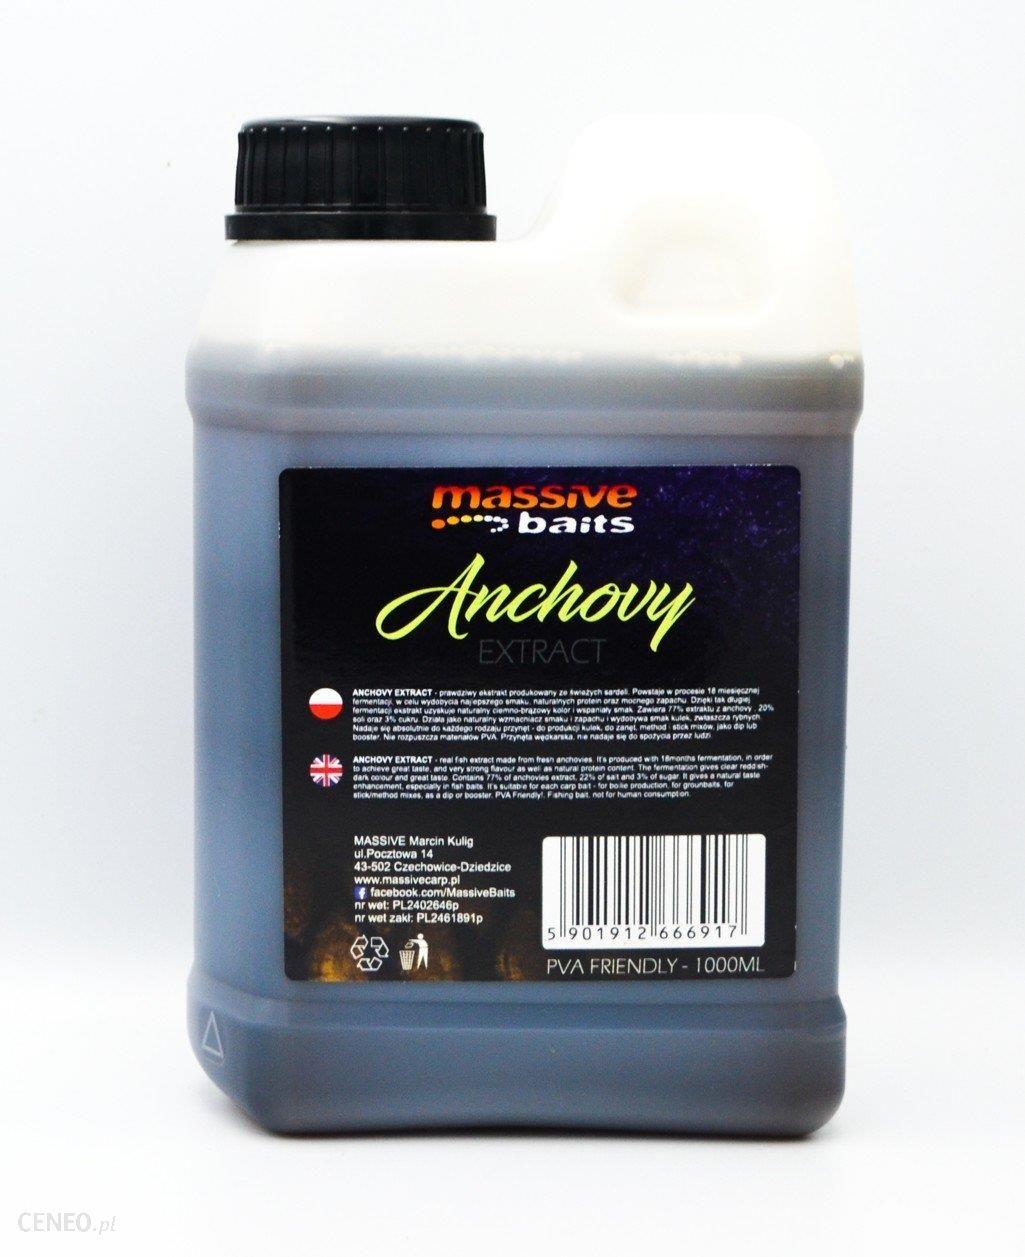 Massive Baits Anchovy Extract Liquid